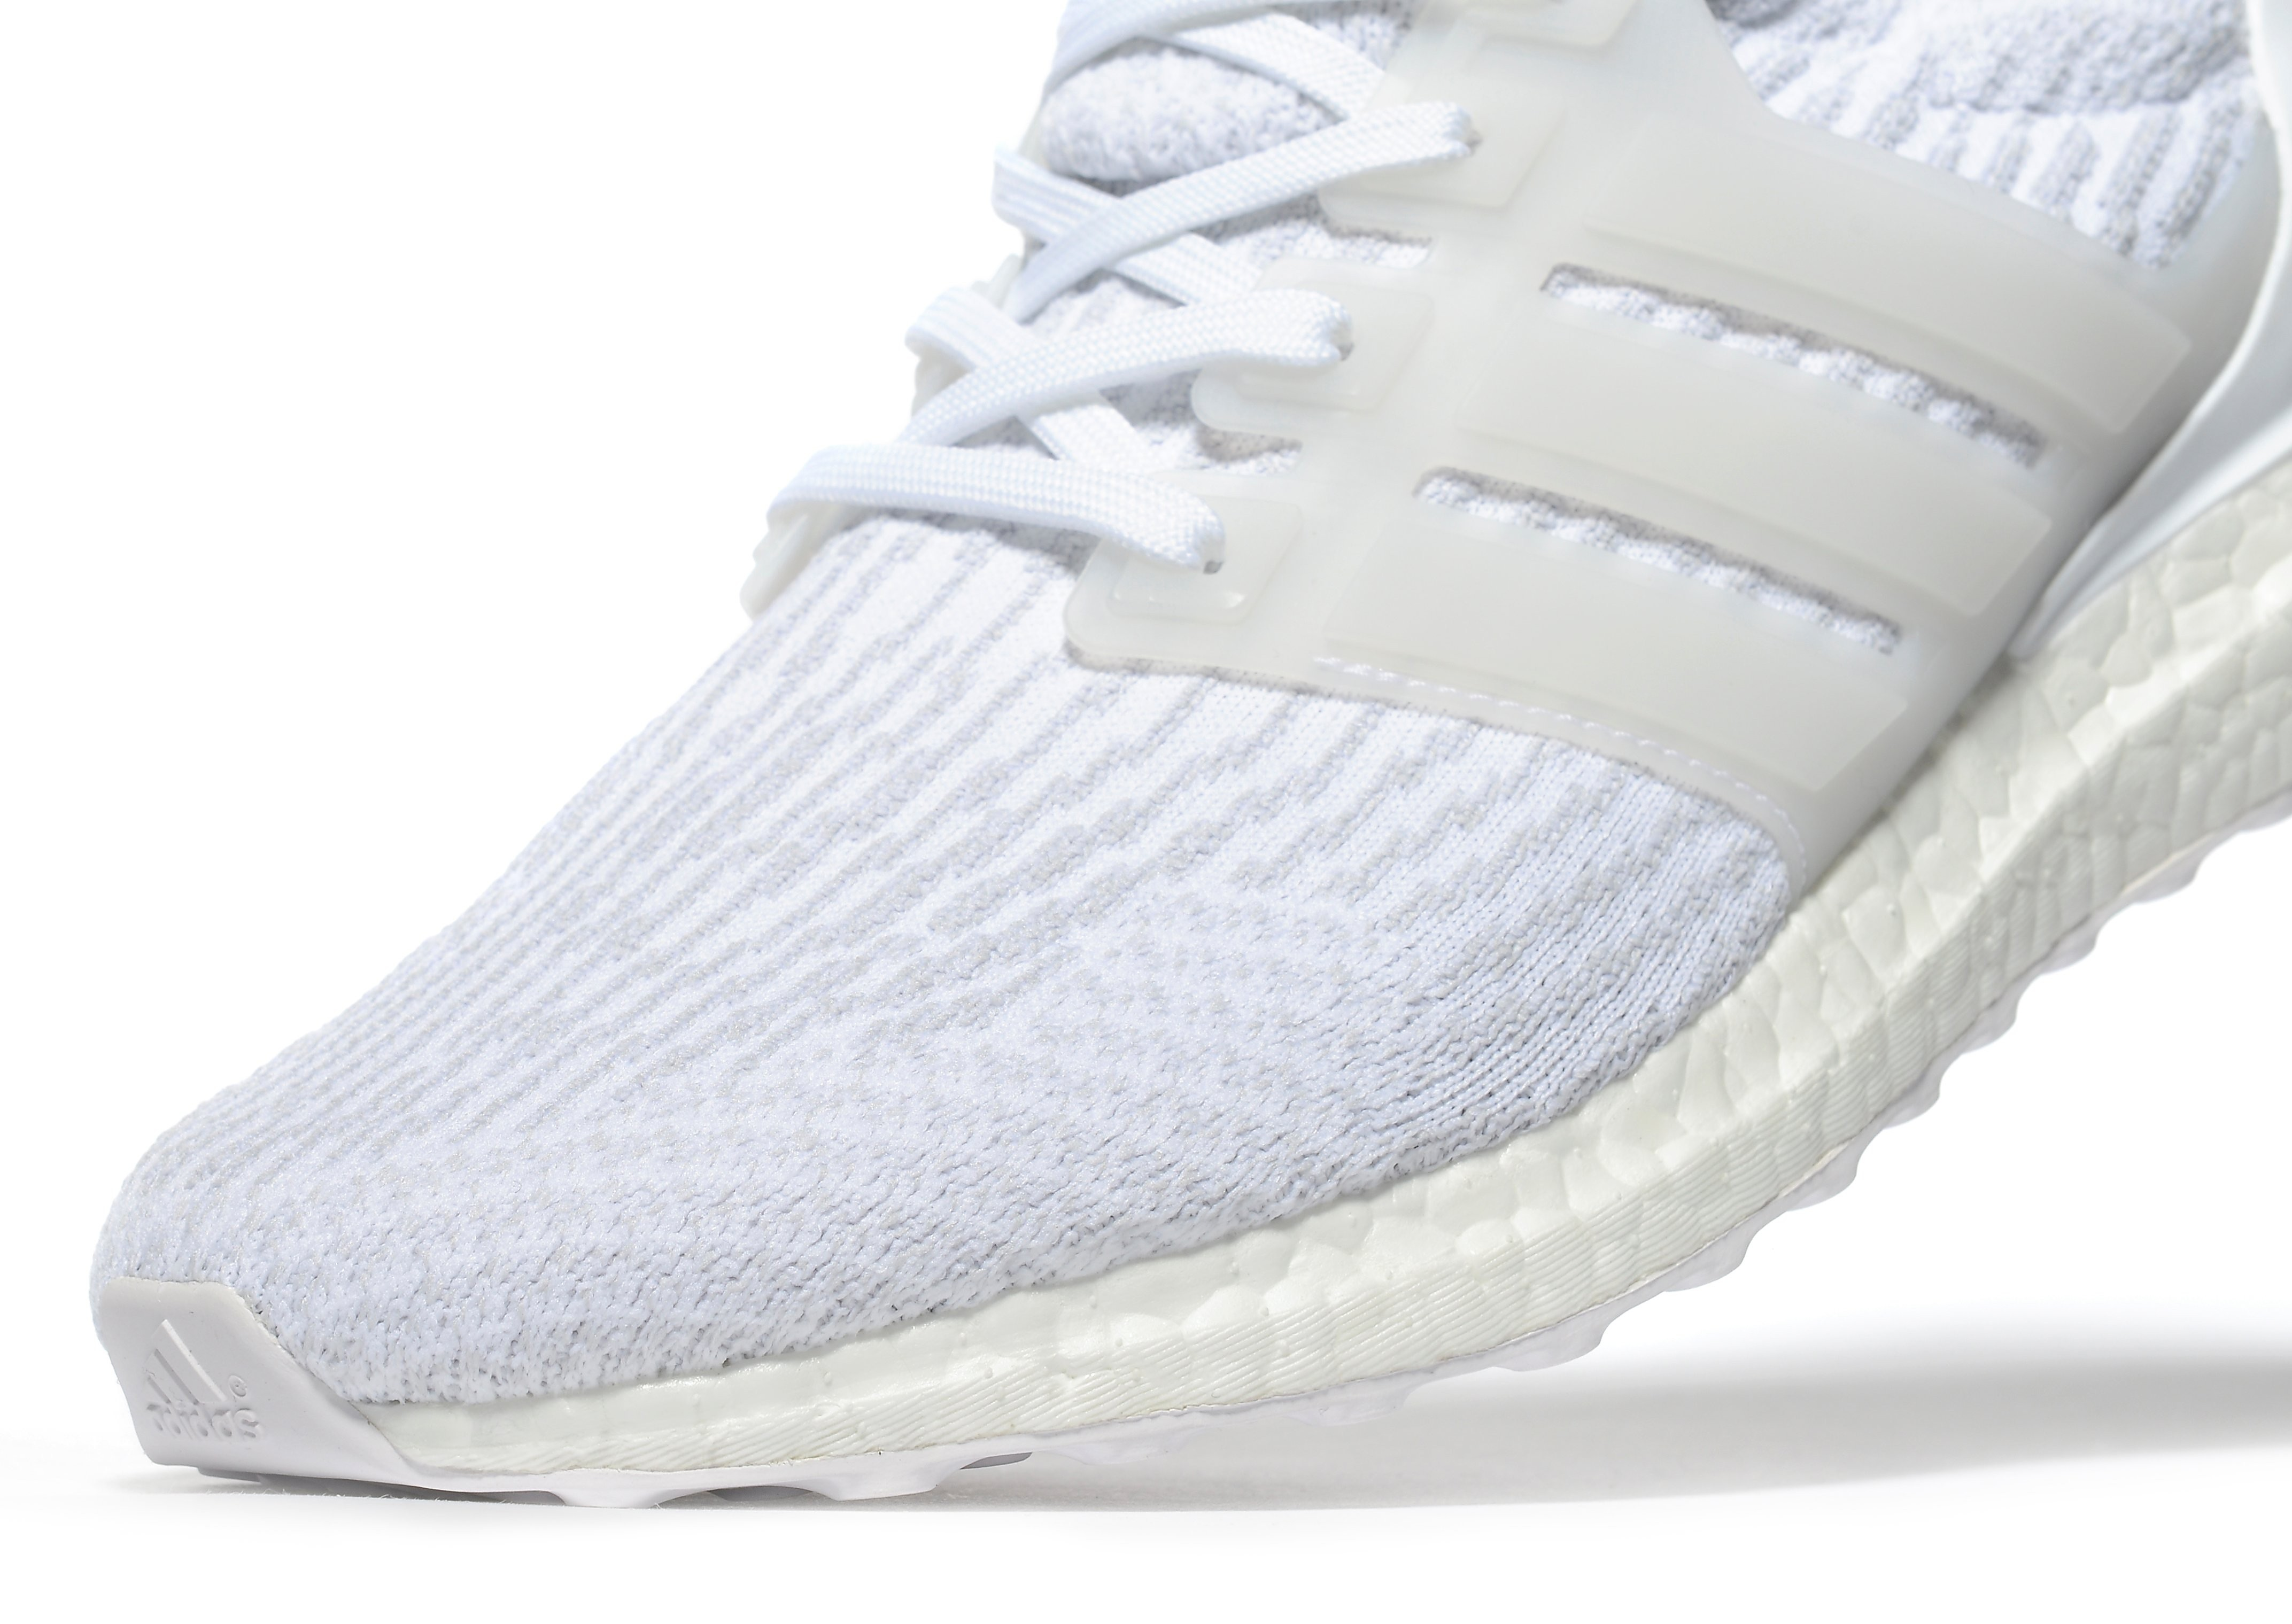 Vendita adidas scarpe da corsa uomini jd sports